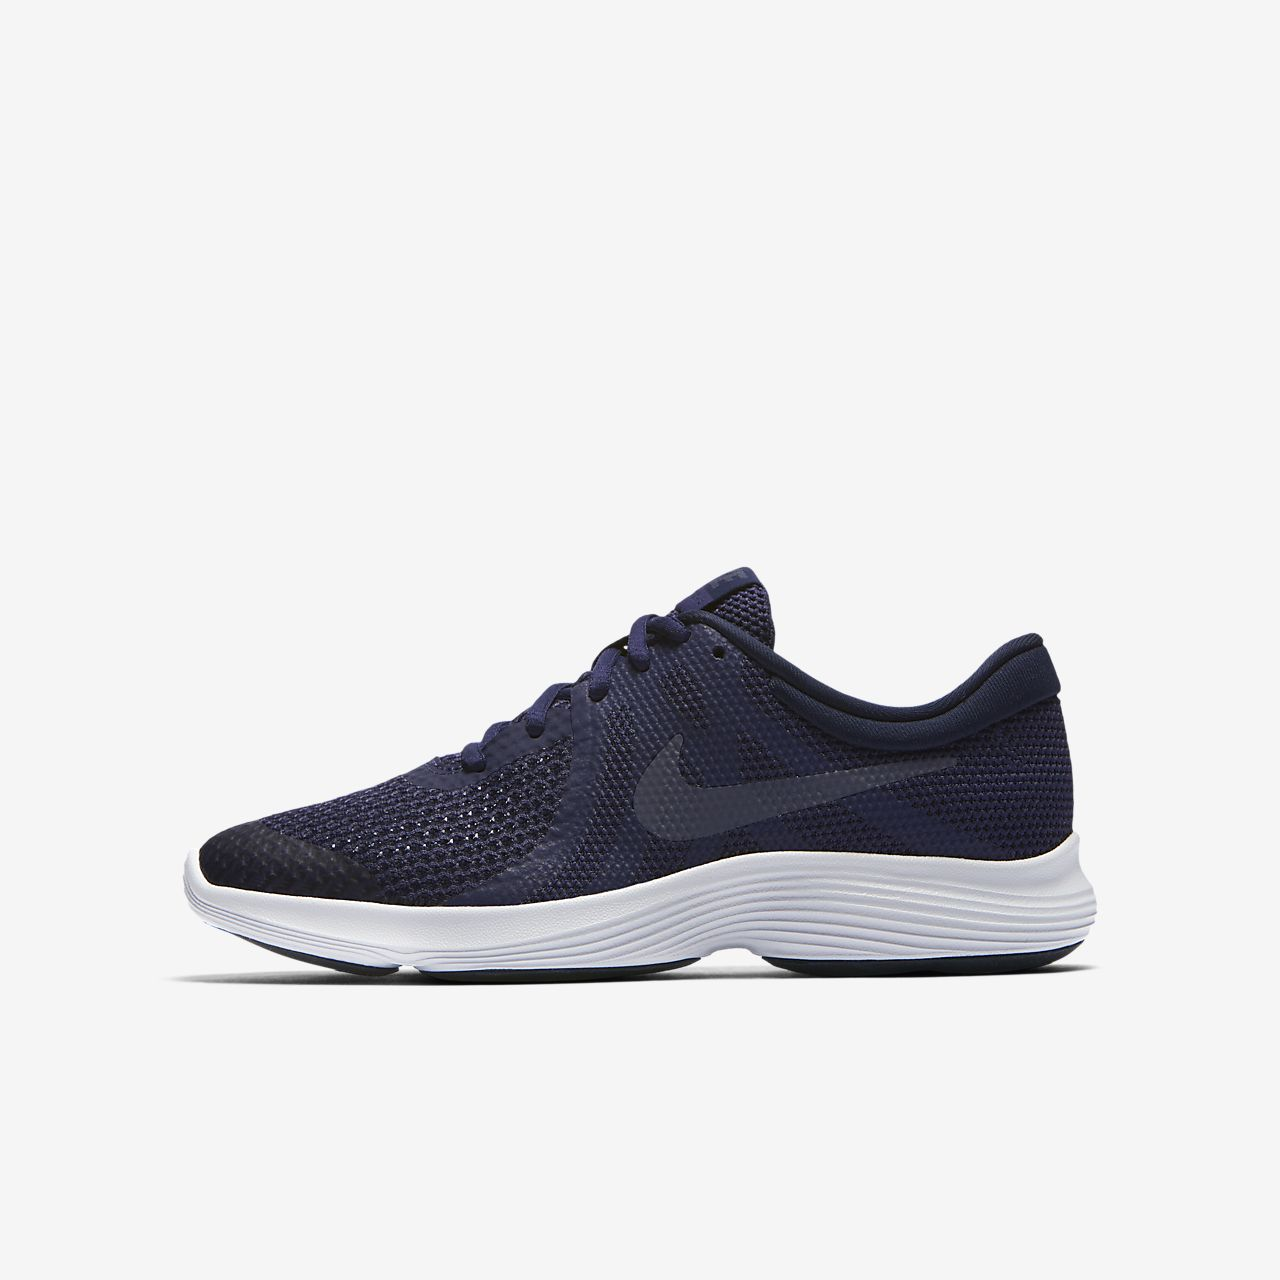 Nike Revolution 4 Zapatillas de running - Niño/a